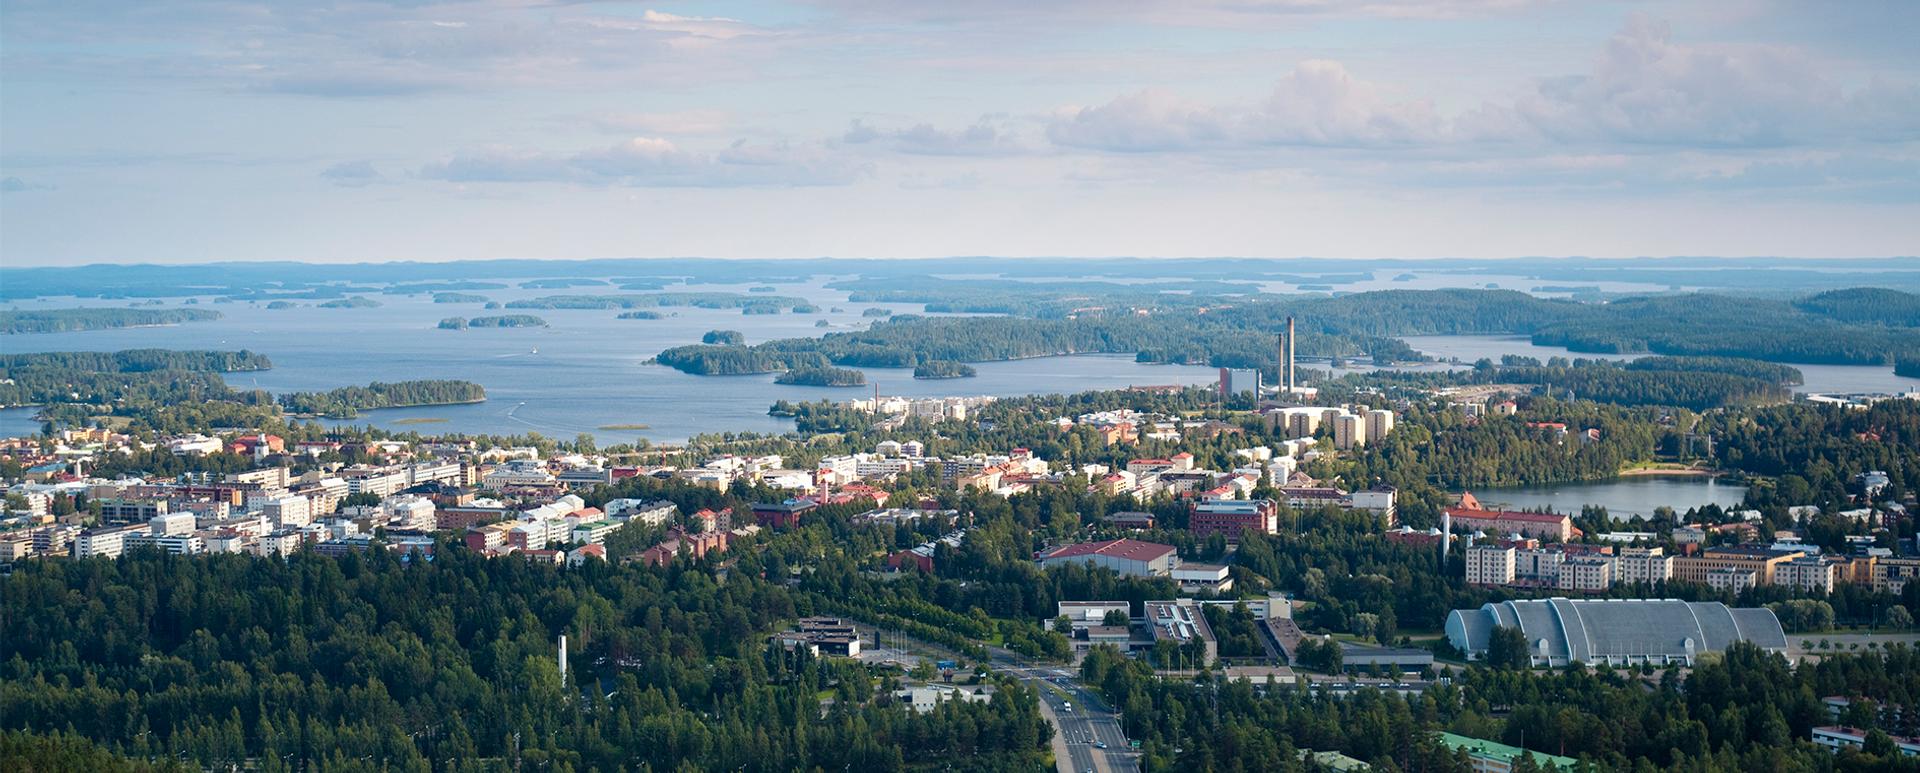 Anticimex Kuopiossa